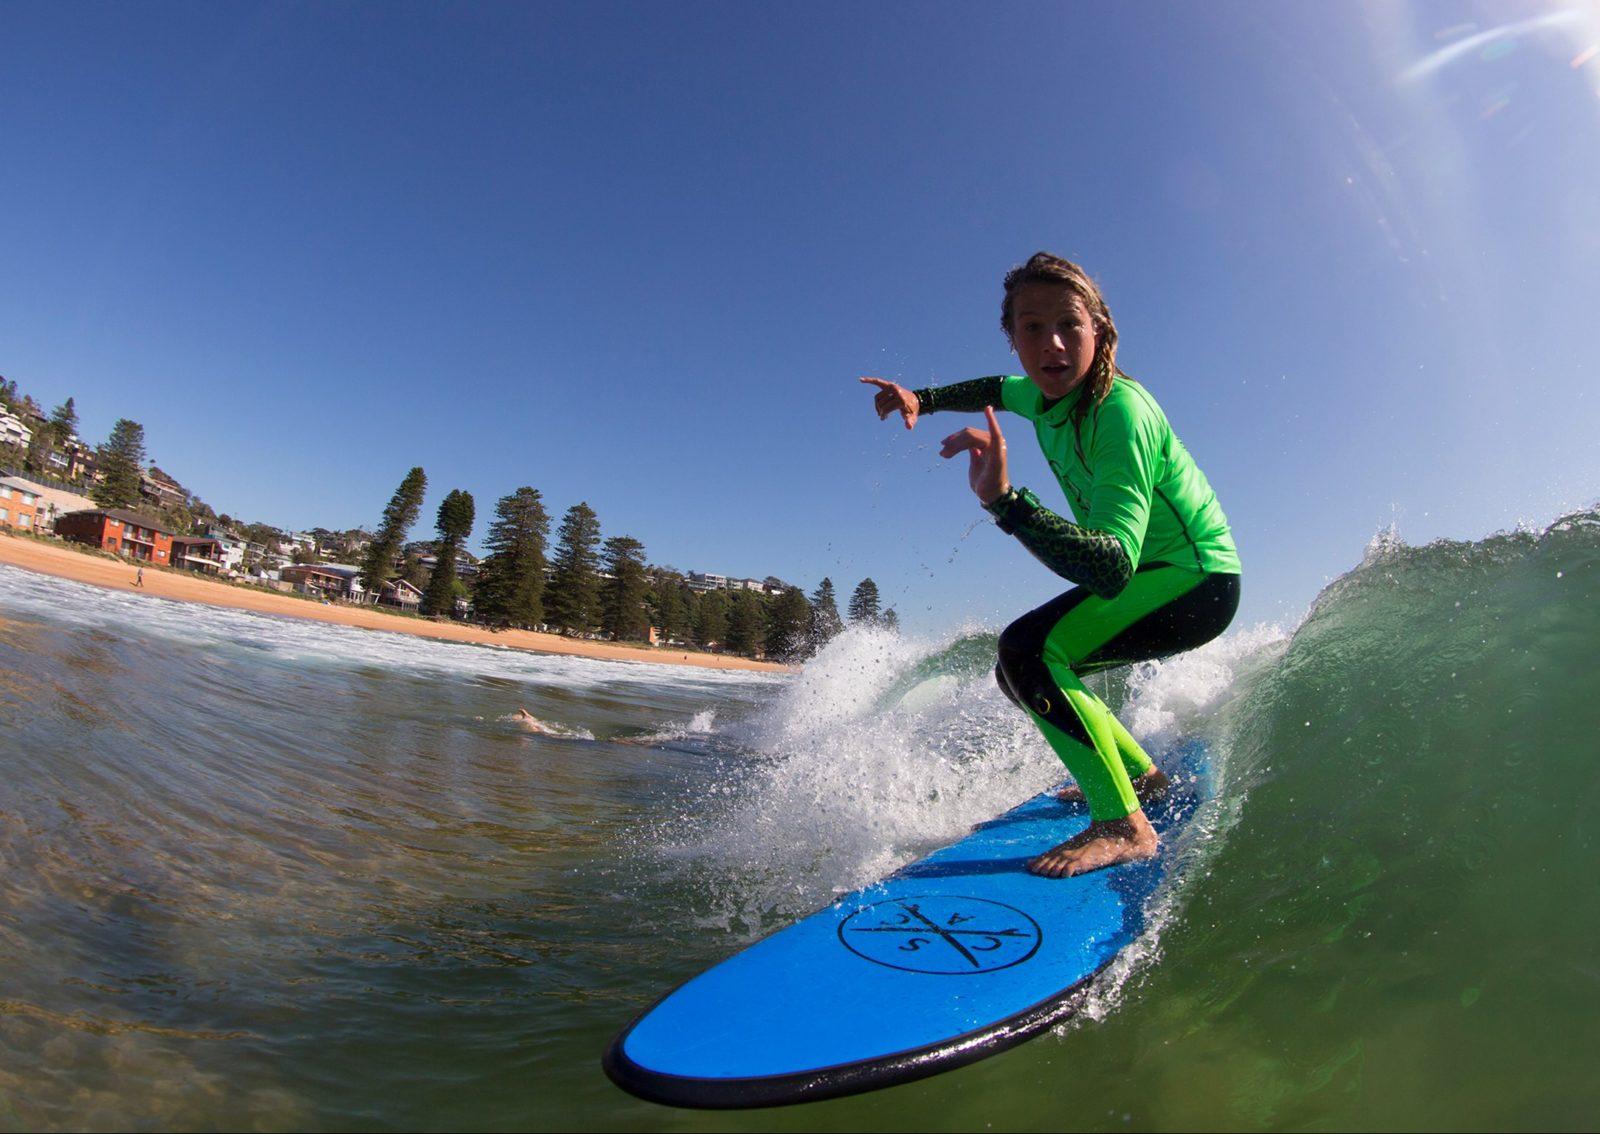 Logan-single surfer